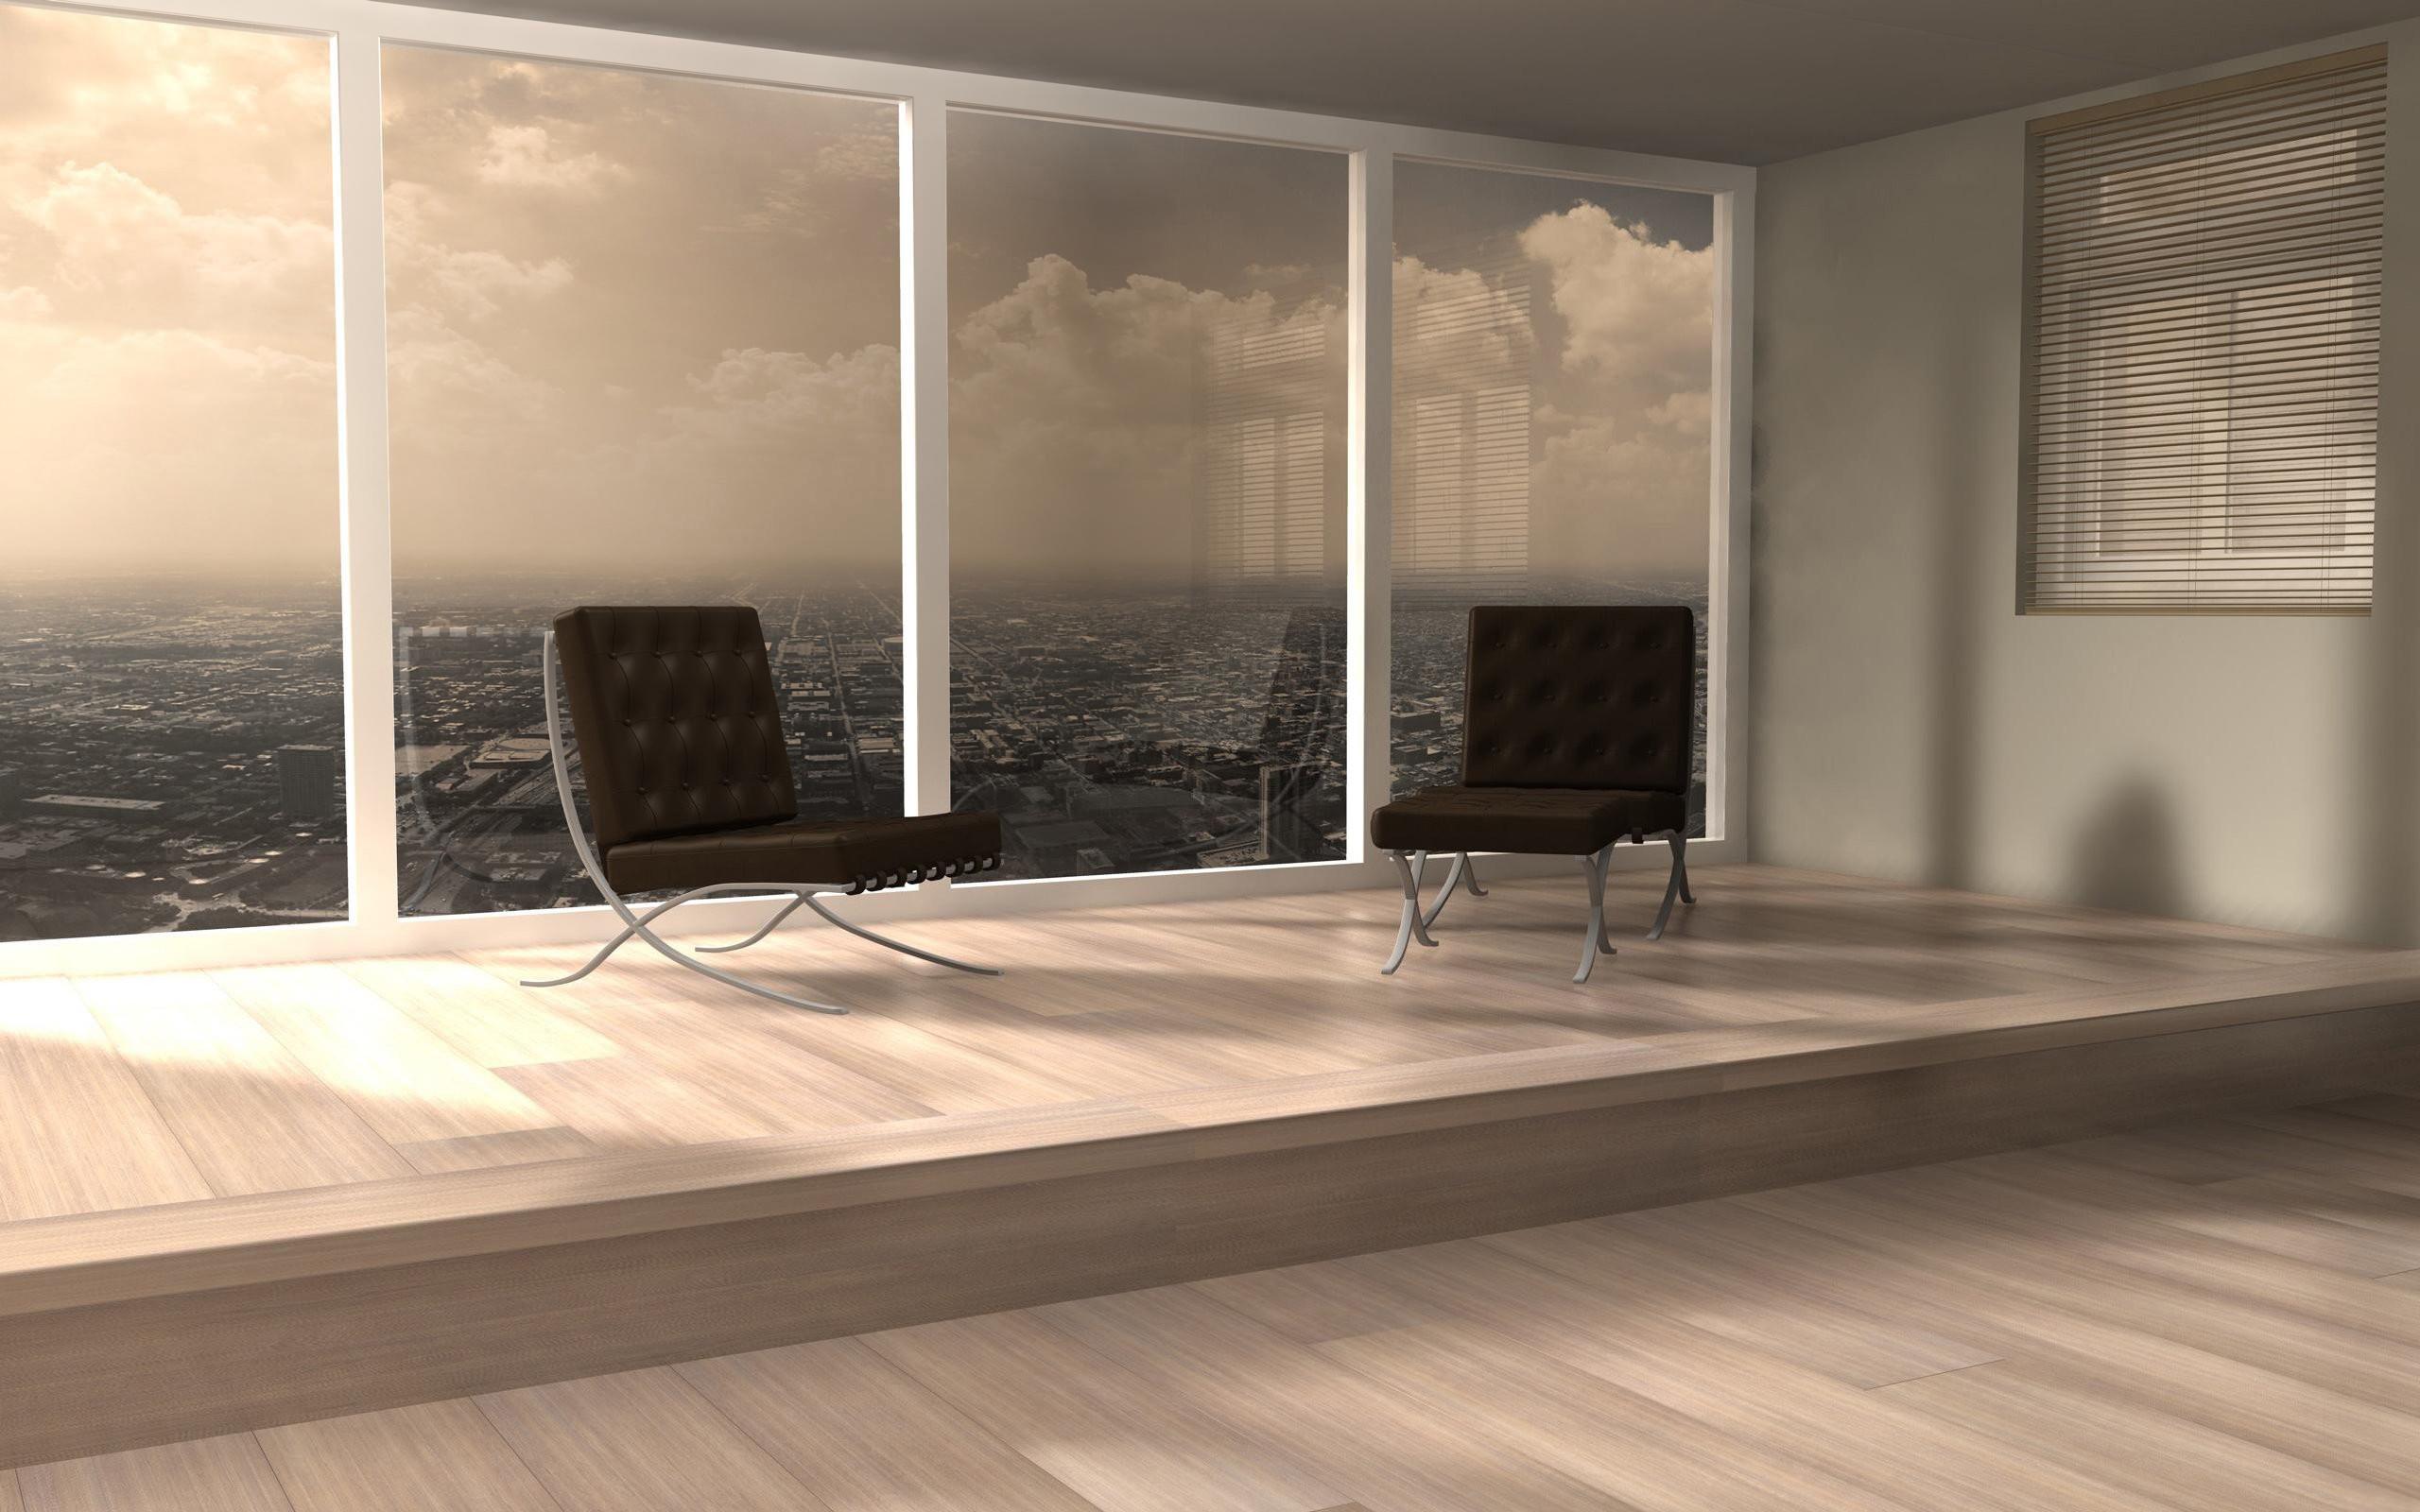 2560x1600 0 3d Empty Room Desktop Wallpaper Ideas For The House Office